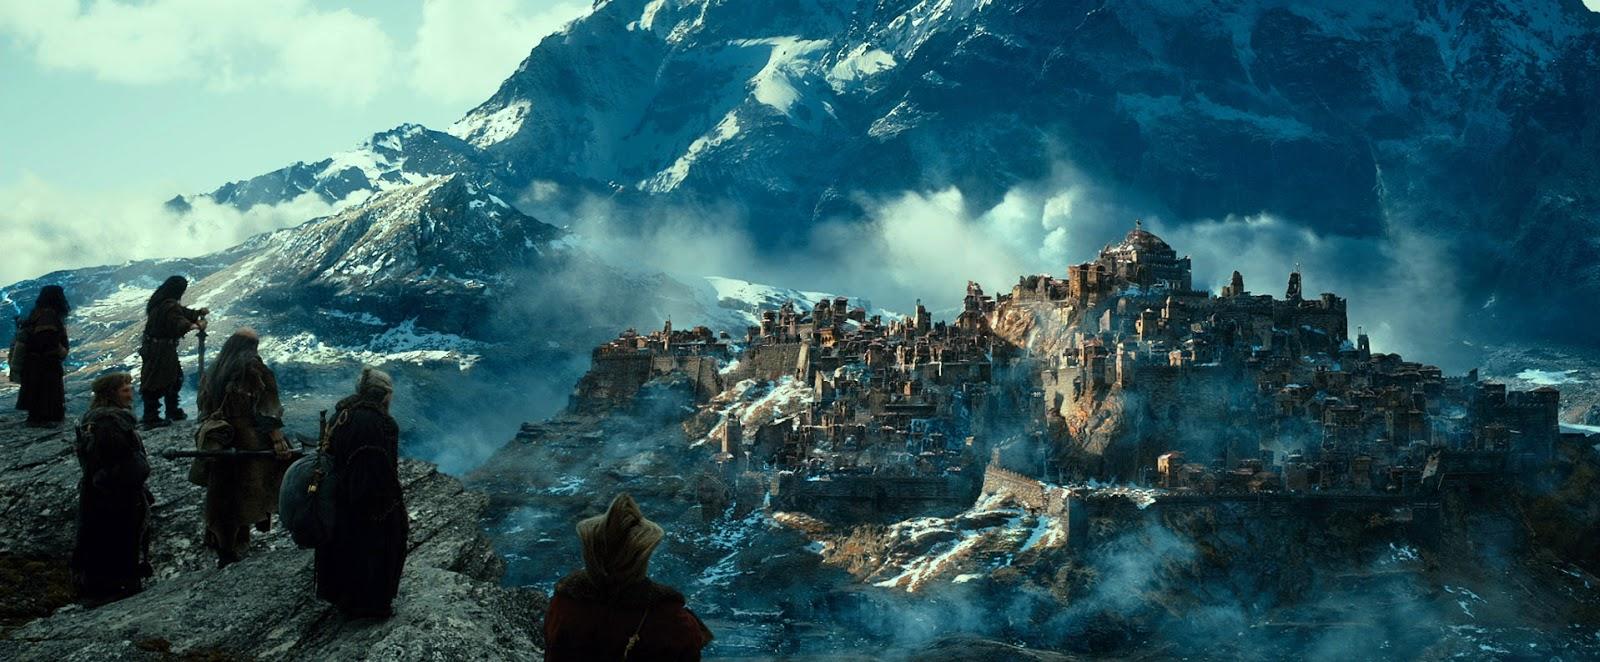 The Hobbit: The Battle Of The Five Armies desktop wallpaper